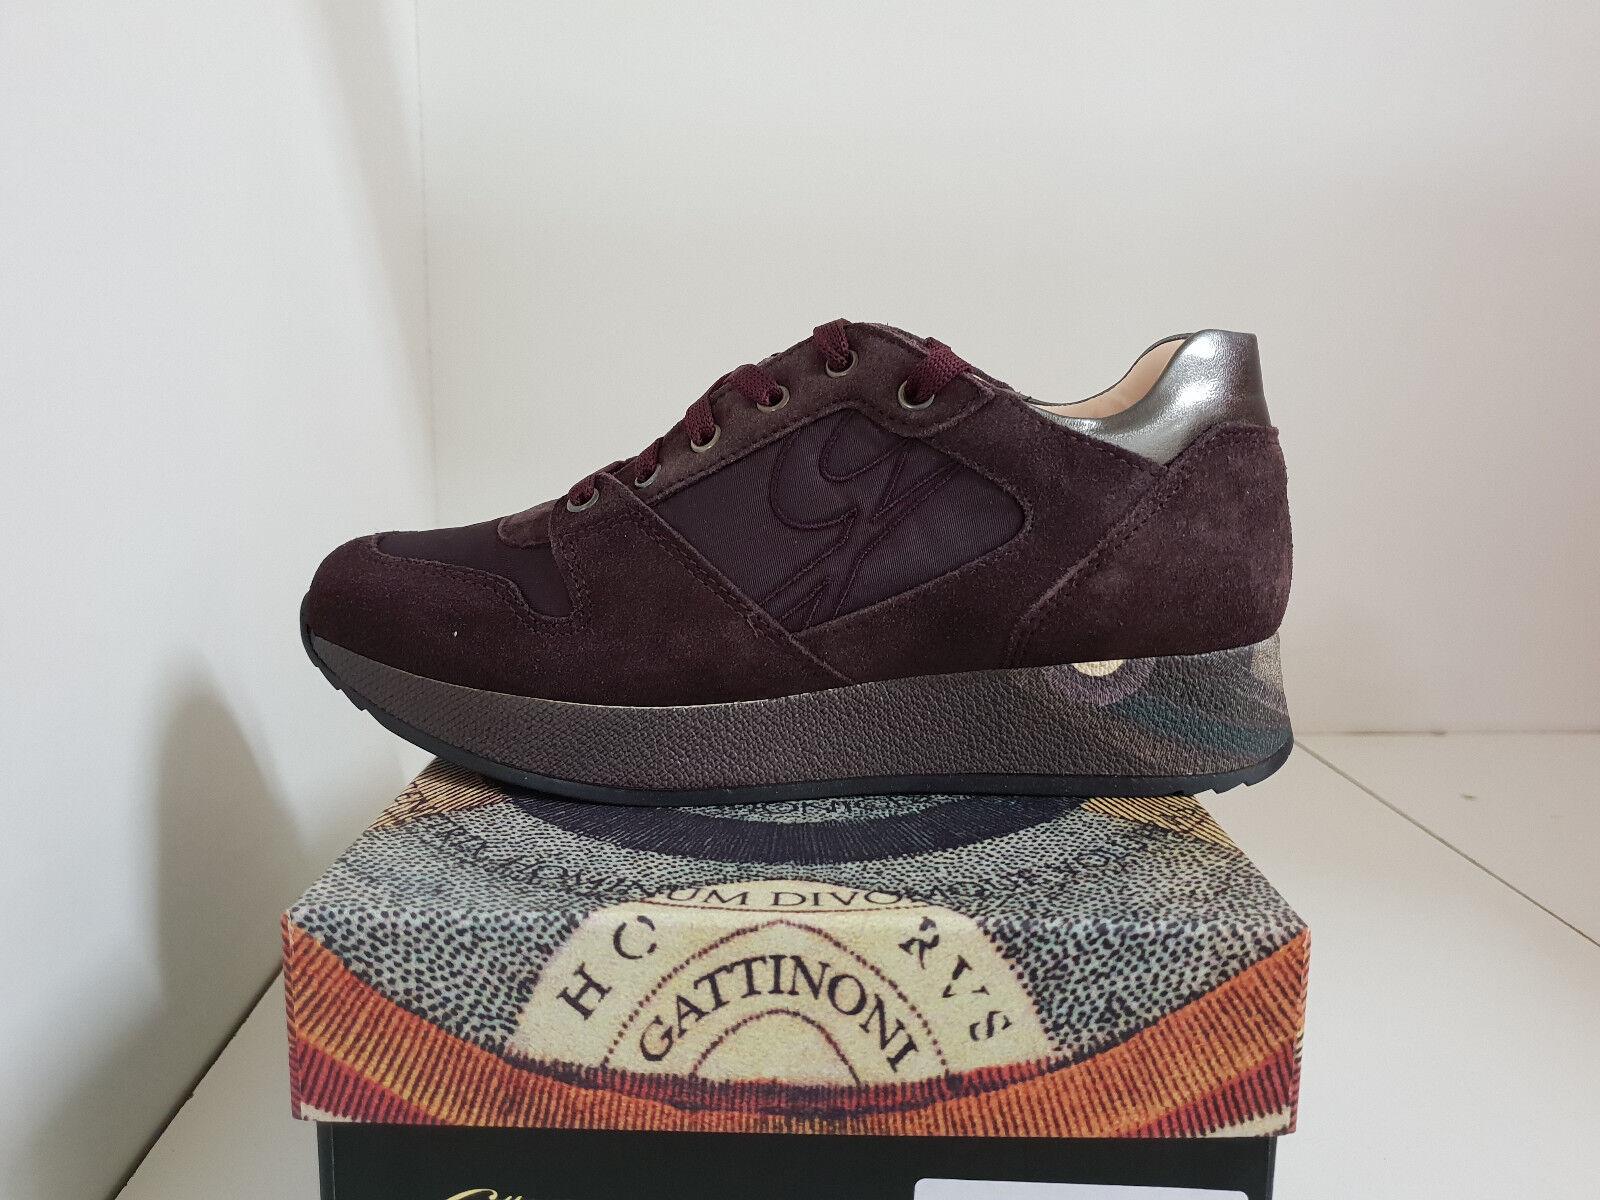 Schuhe Gattinoni PIGAB6087WDT446 Turnschuhe Turnschuhe Bordeaux 2018 Damen Winter